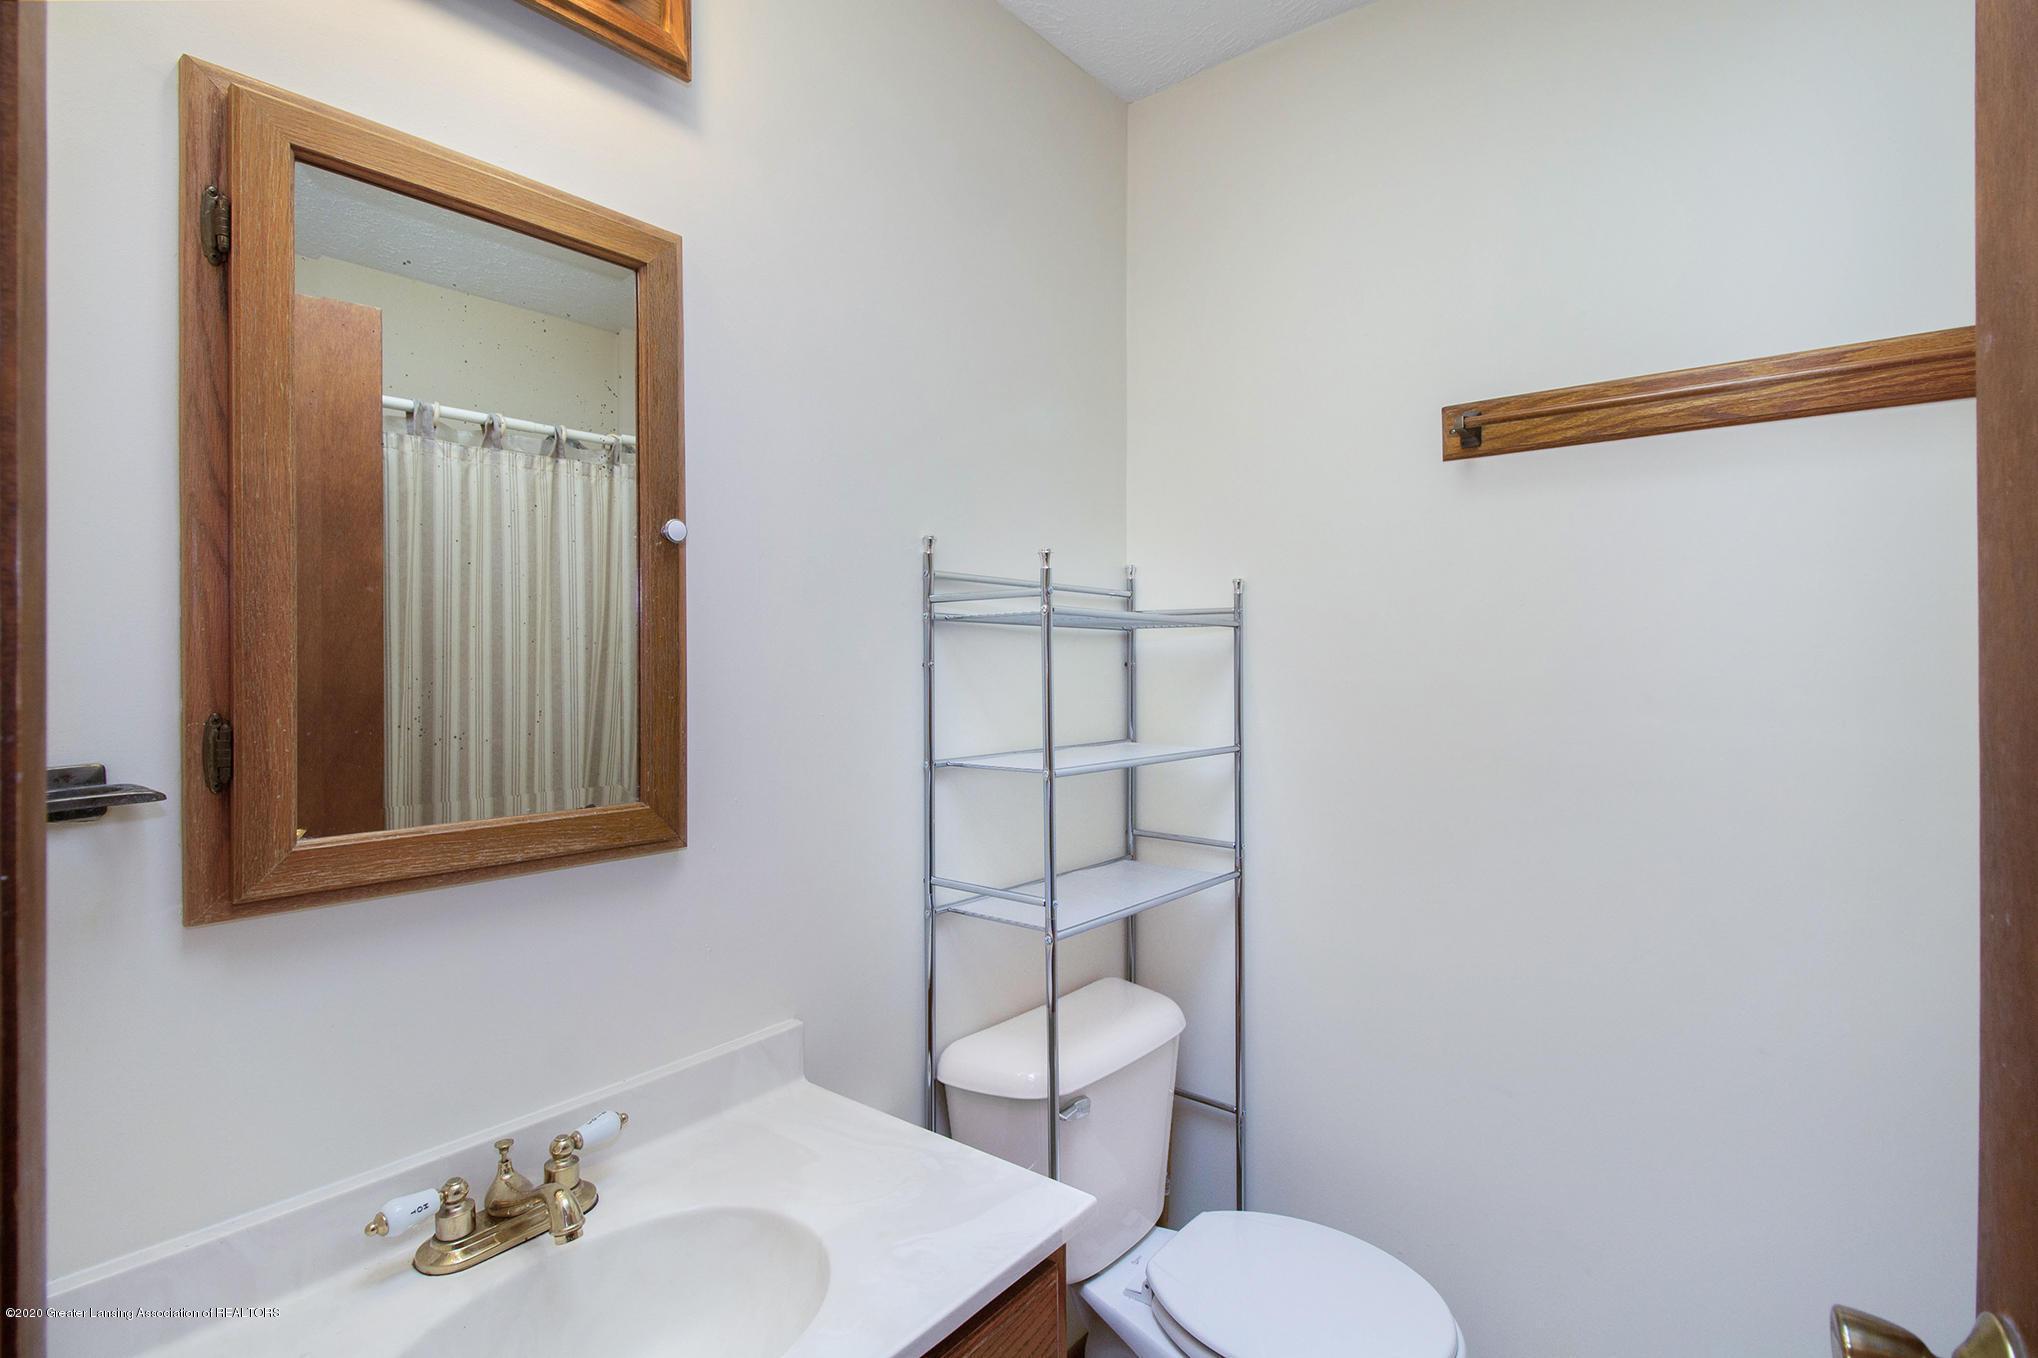 4510 Dobie Rd - Bathroom 2 - 20